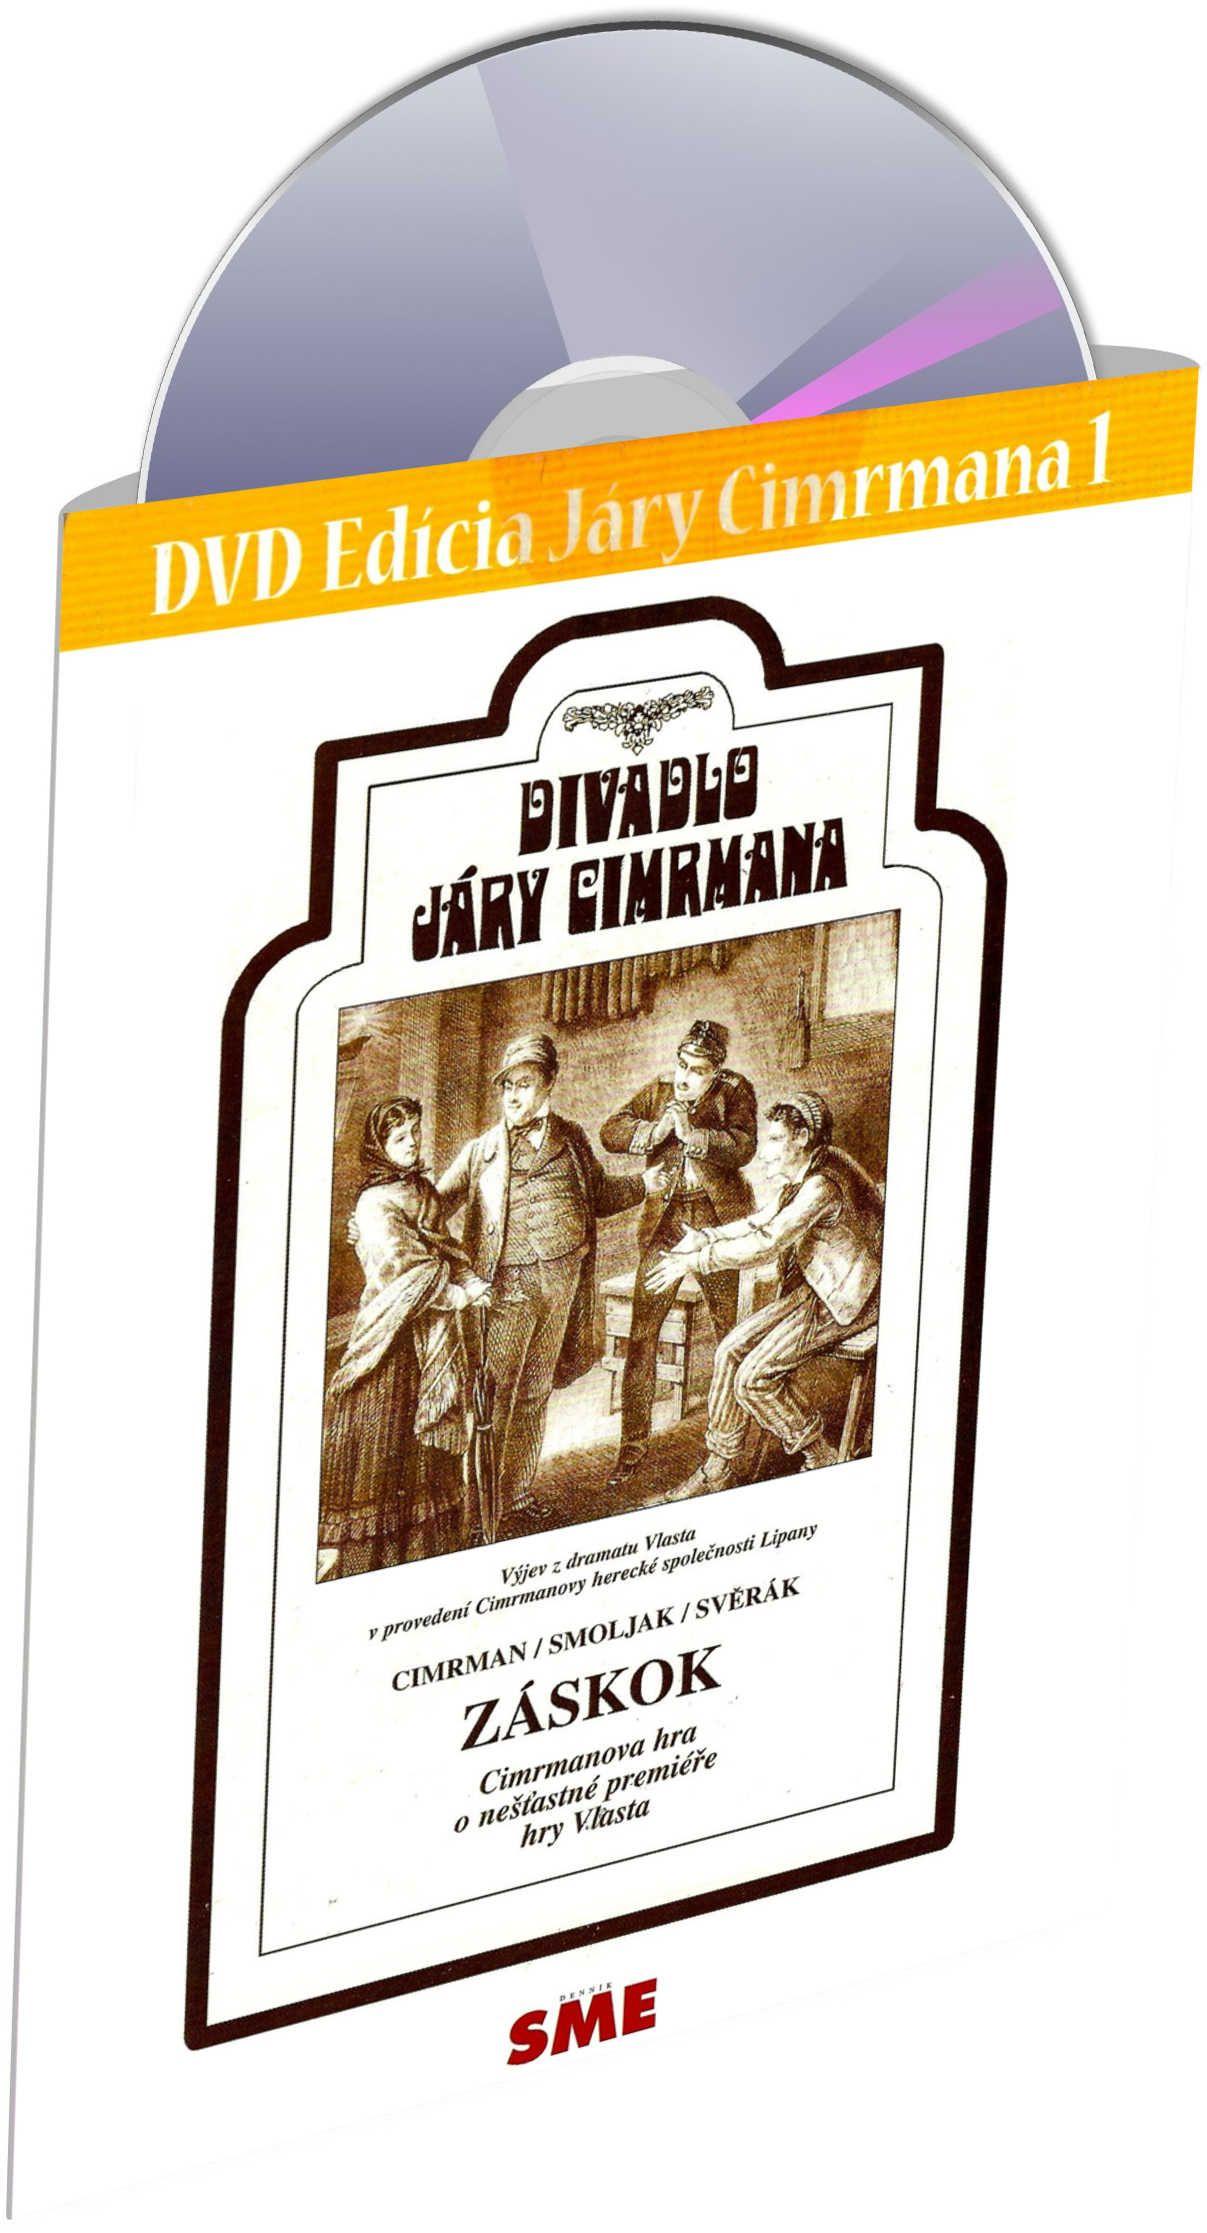 Divadlo Járy Cimrmana DVD1 - Záskok - Edice Denník SME (DVD)